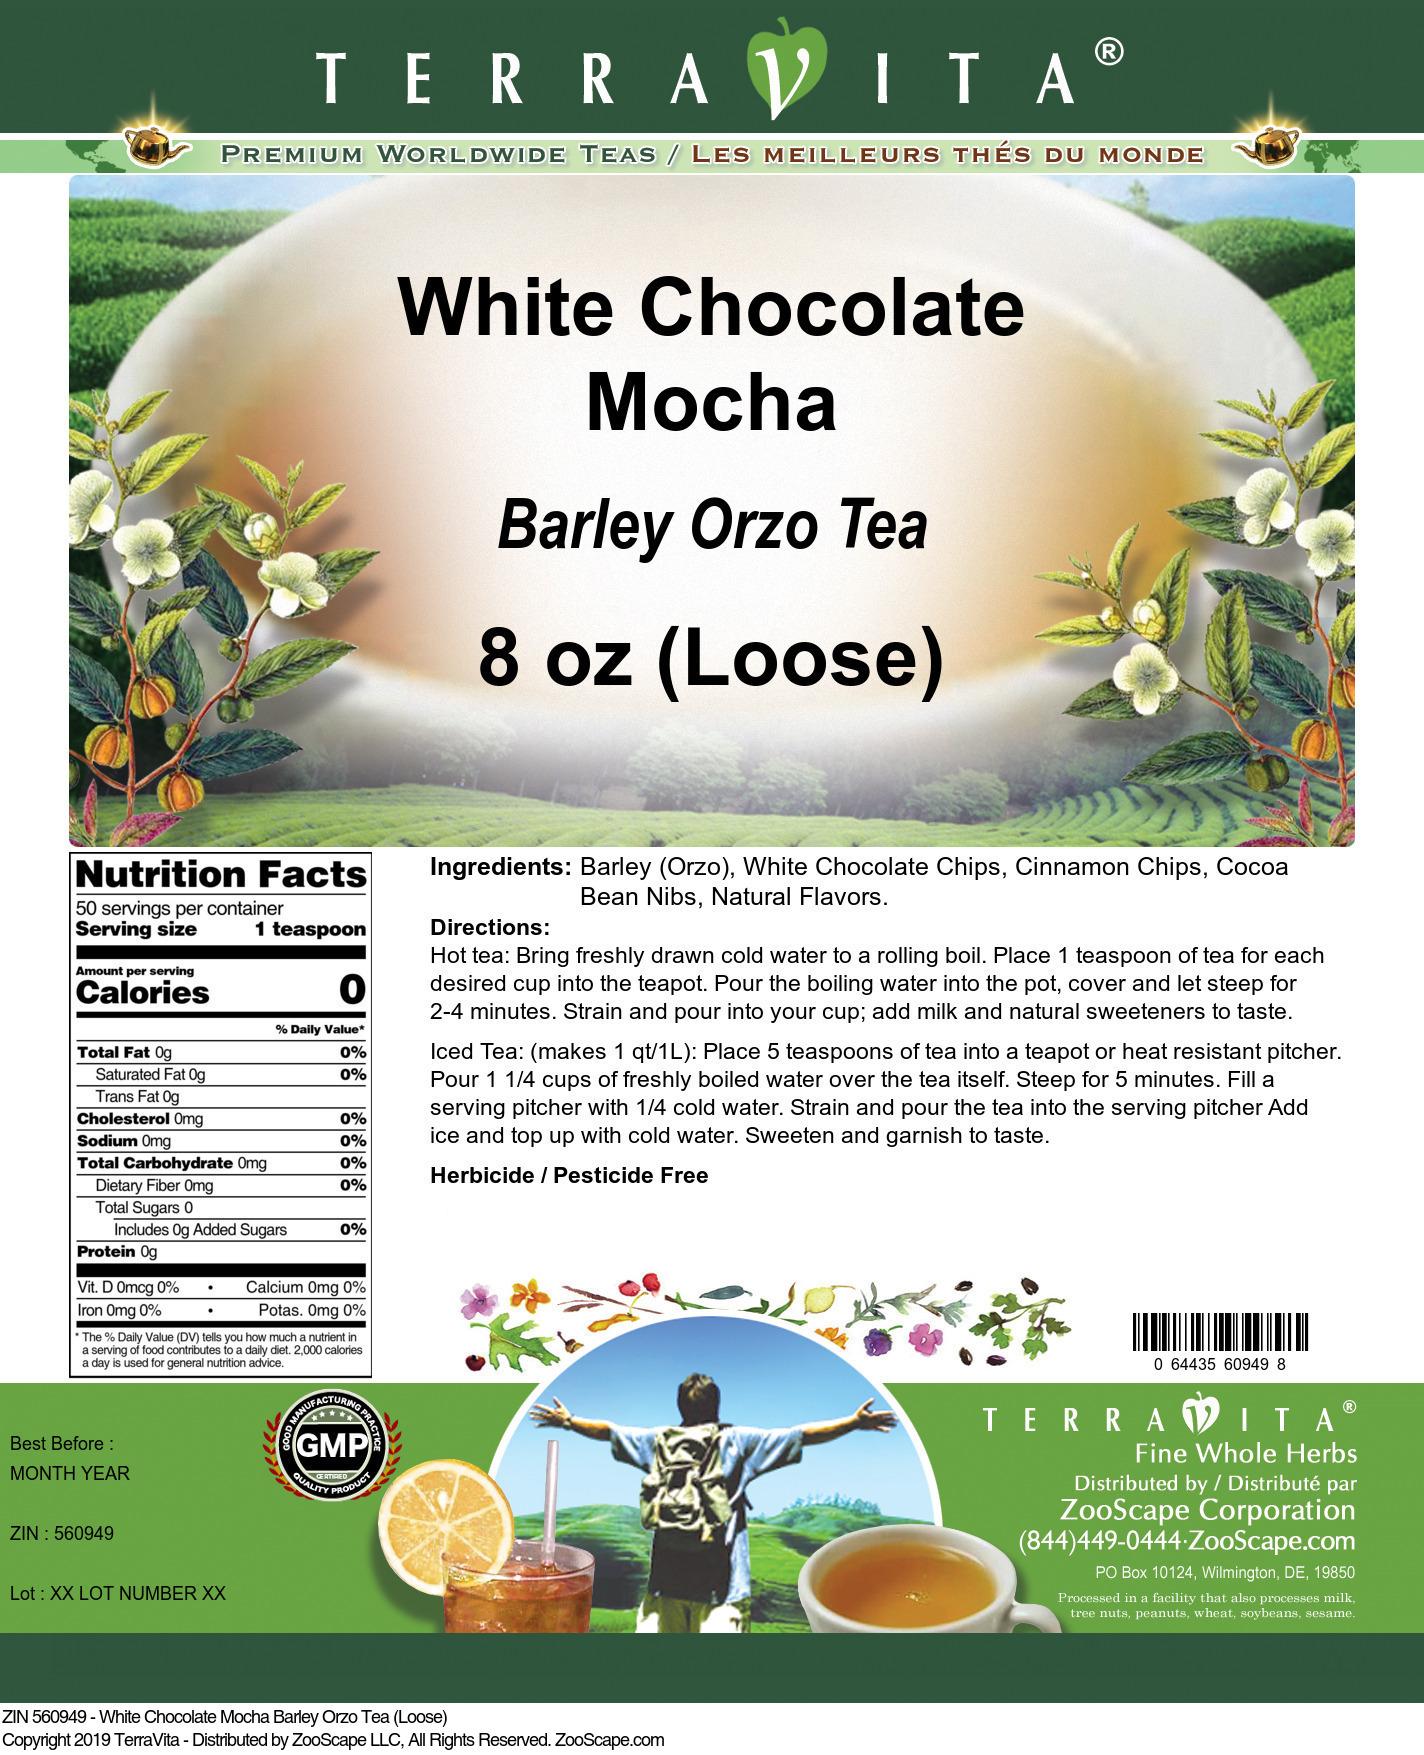 White Chocolate Mocha Barley Orzo